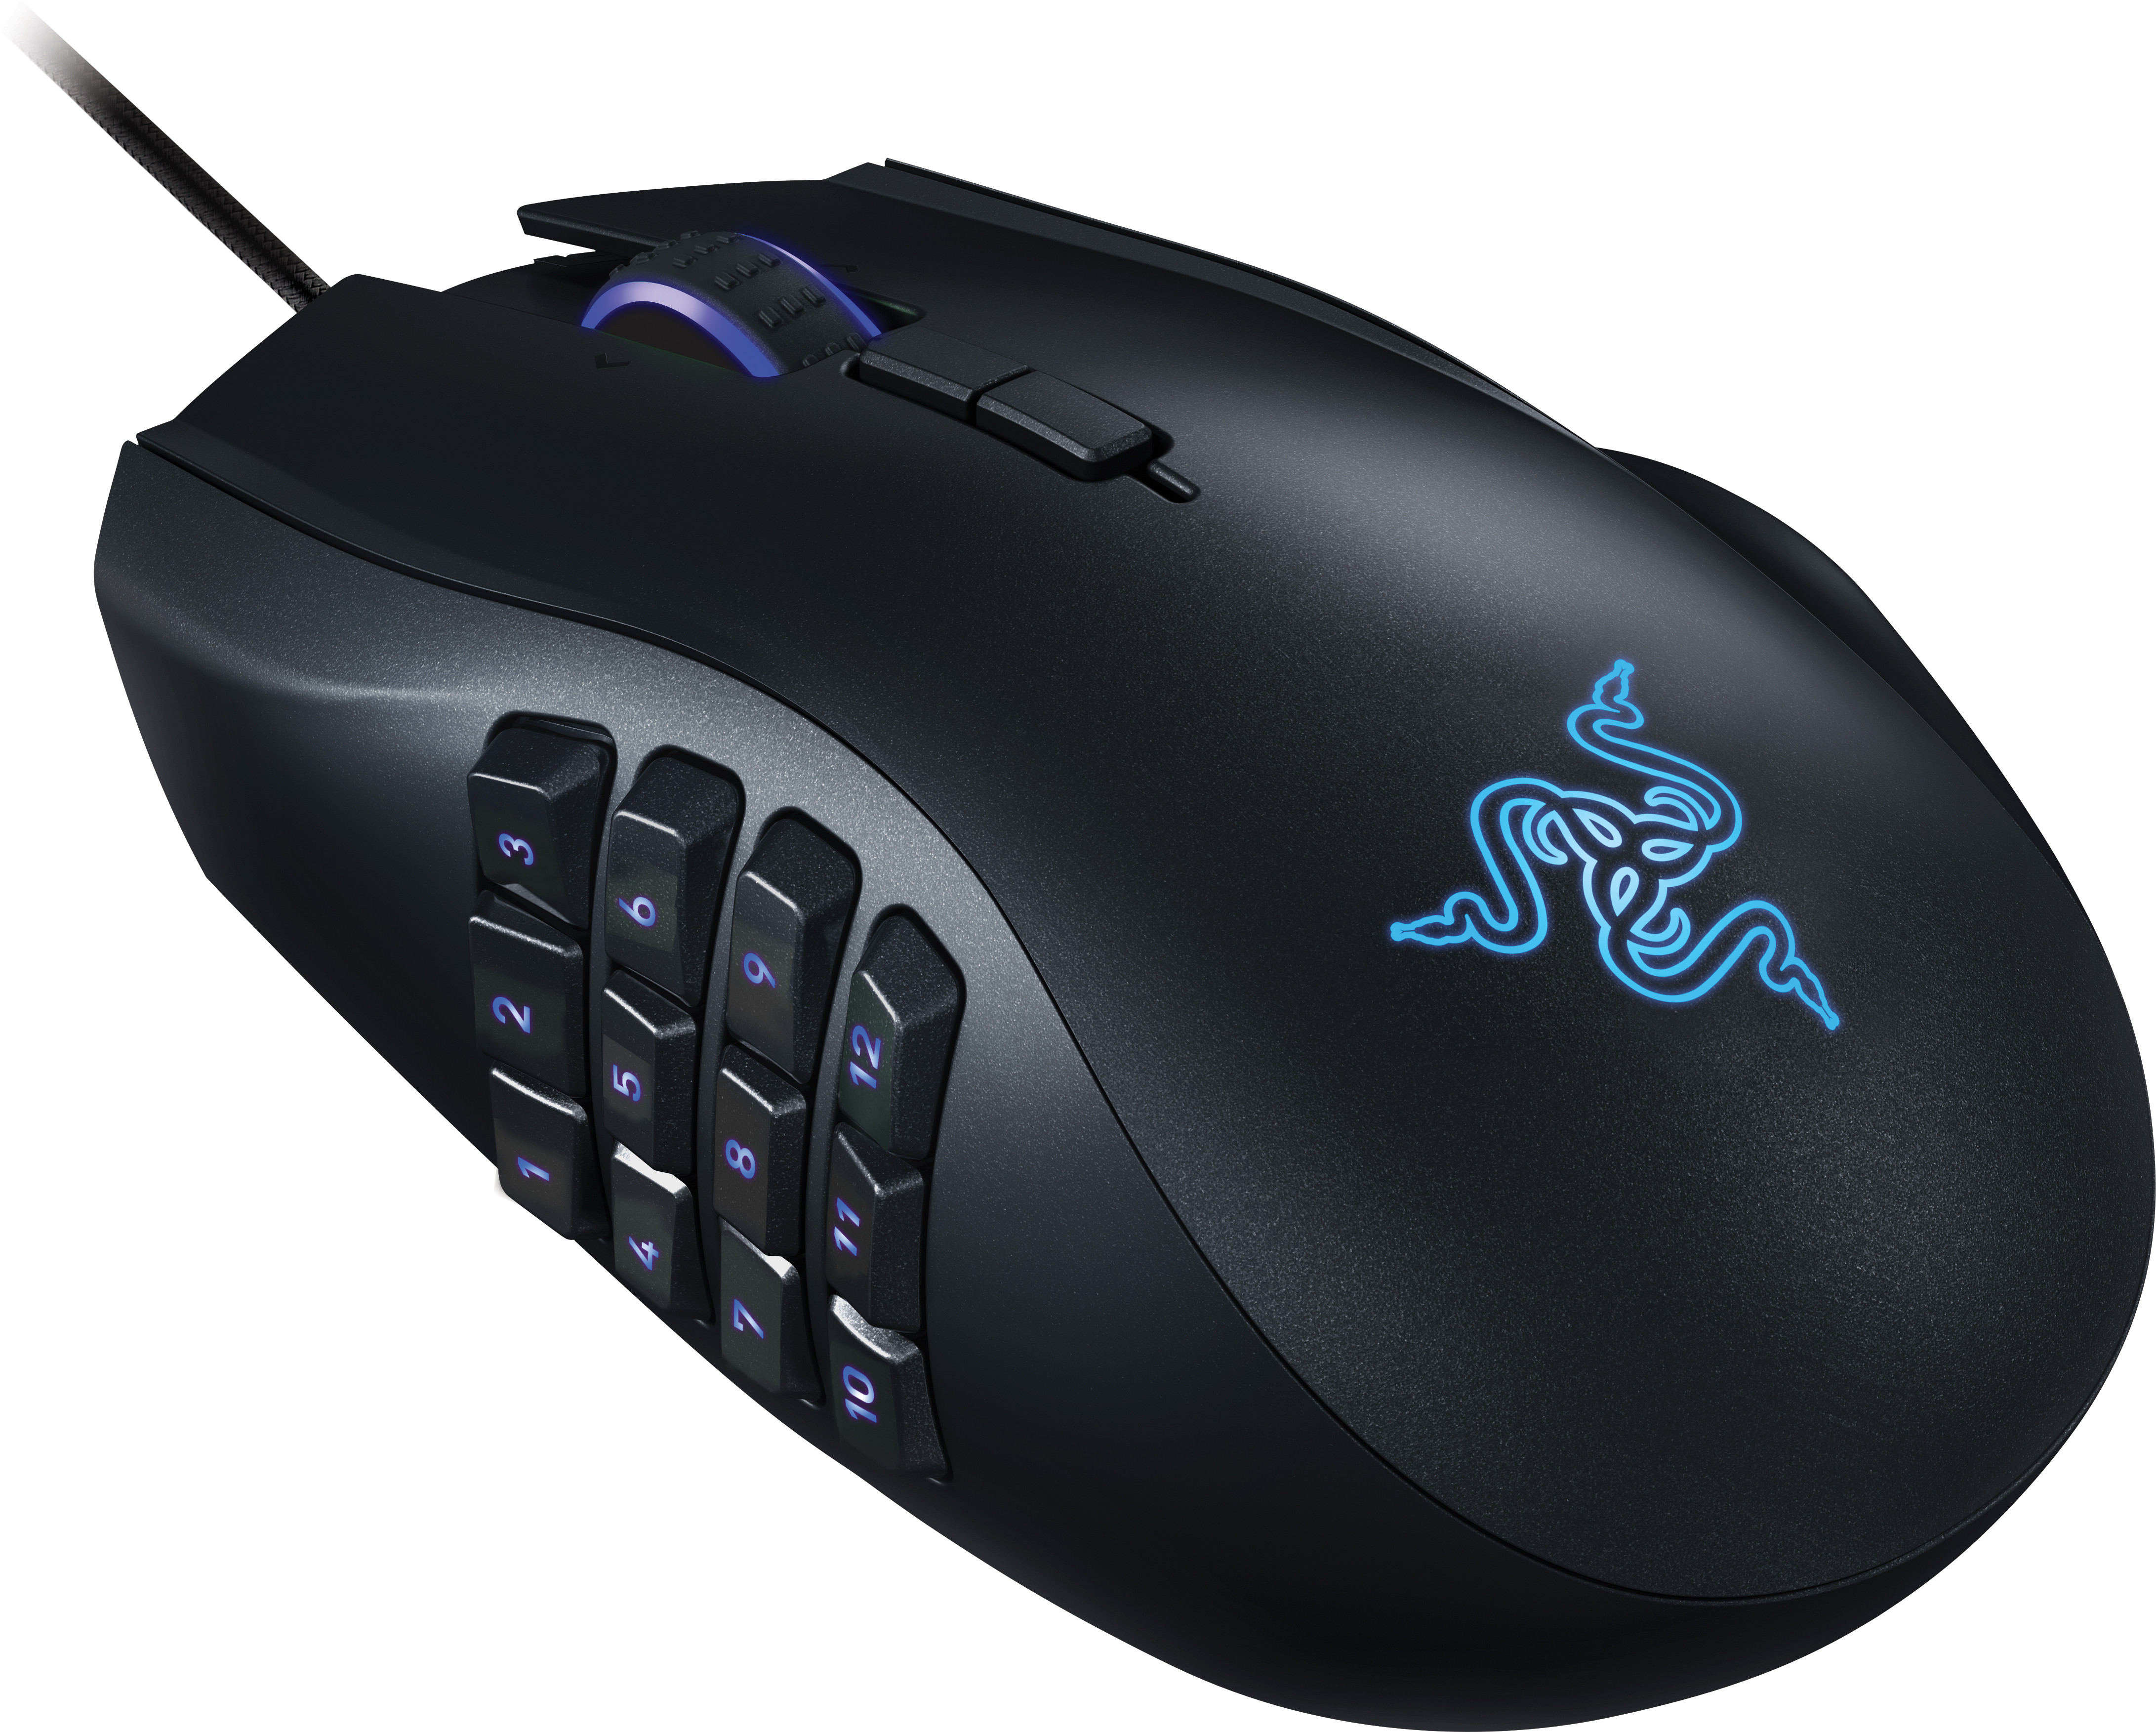 Razer Naga Chroma Gaming USB Mouse by RAZER